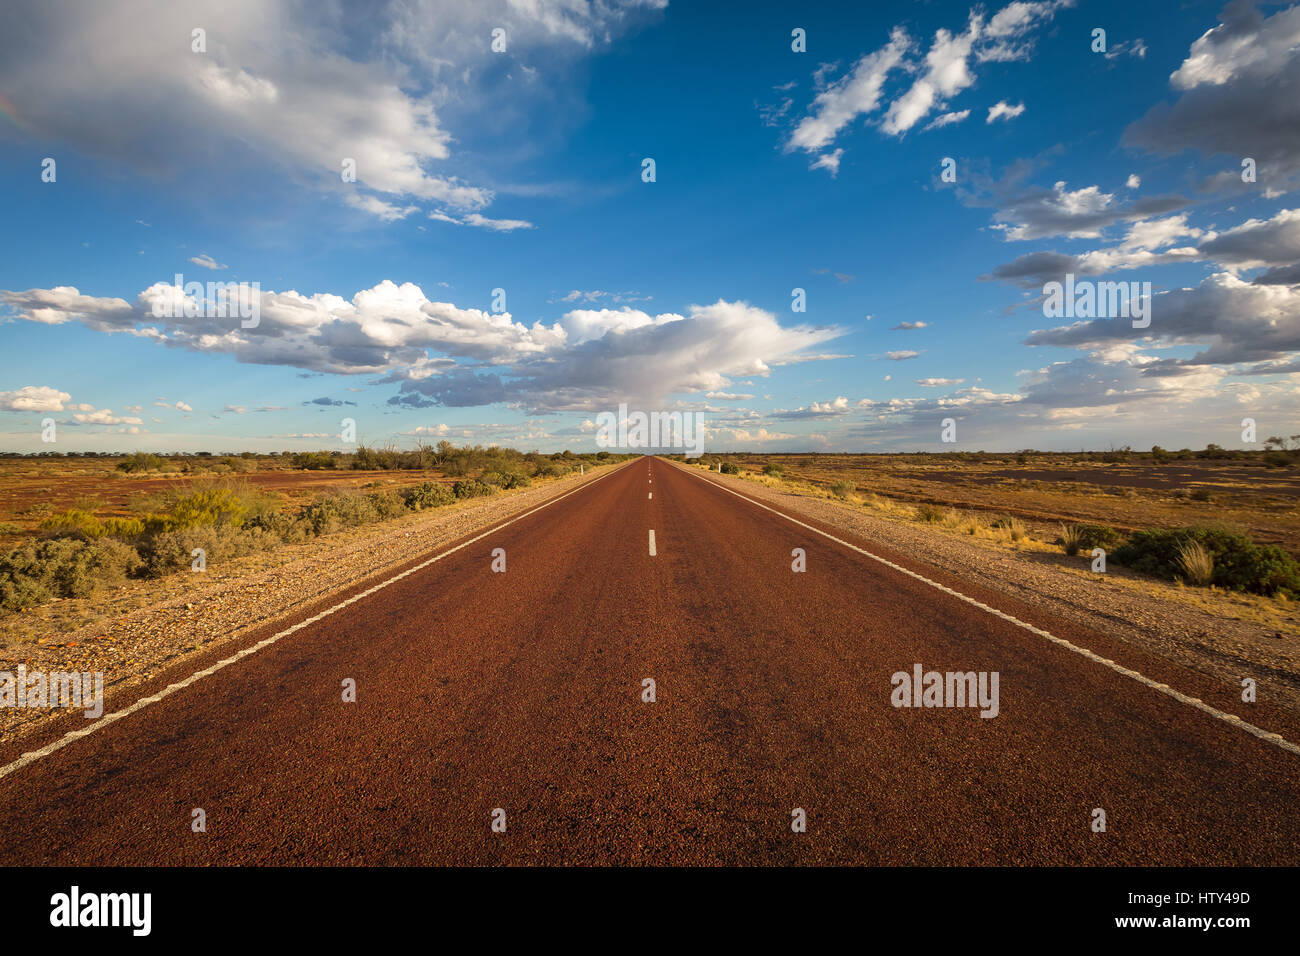 Outback Road - Australia - Stock Image